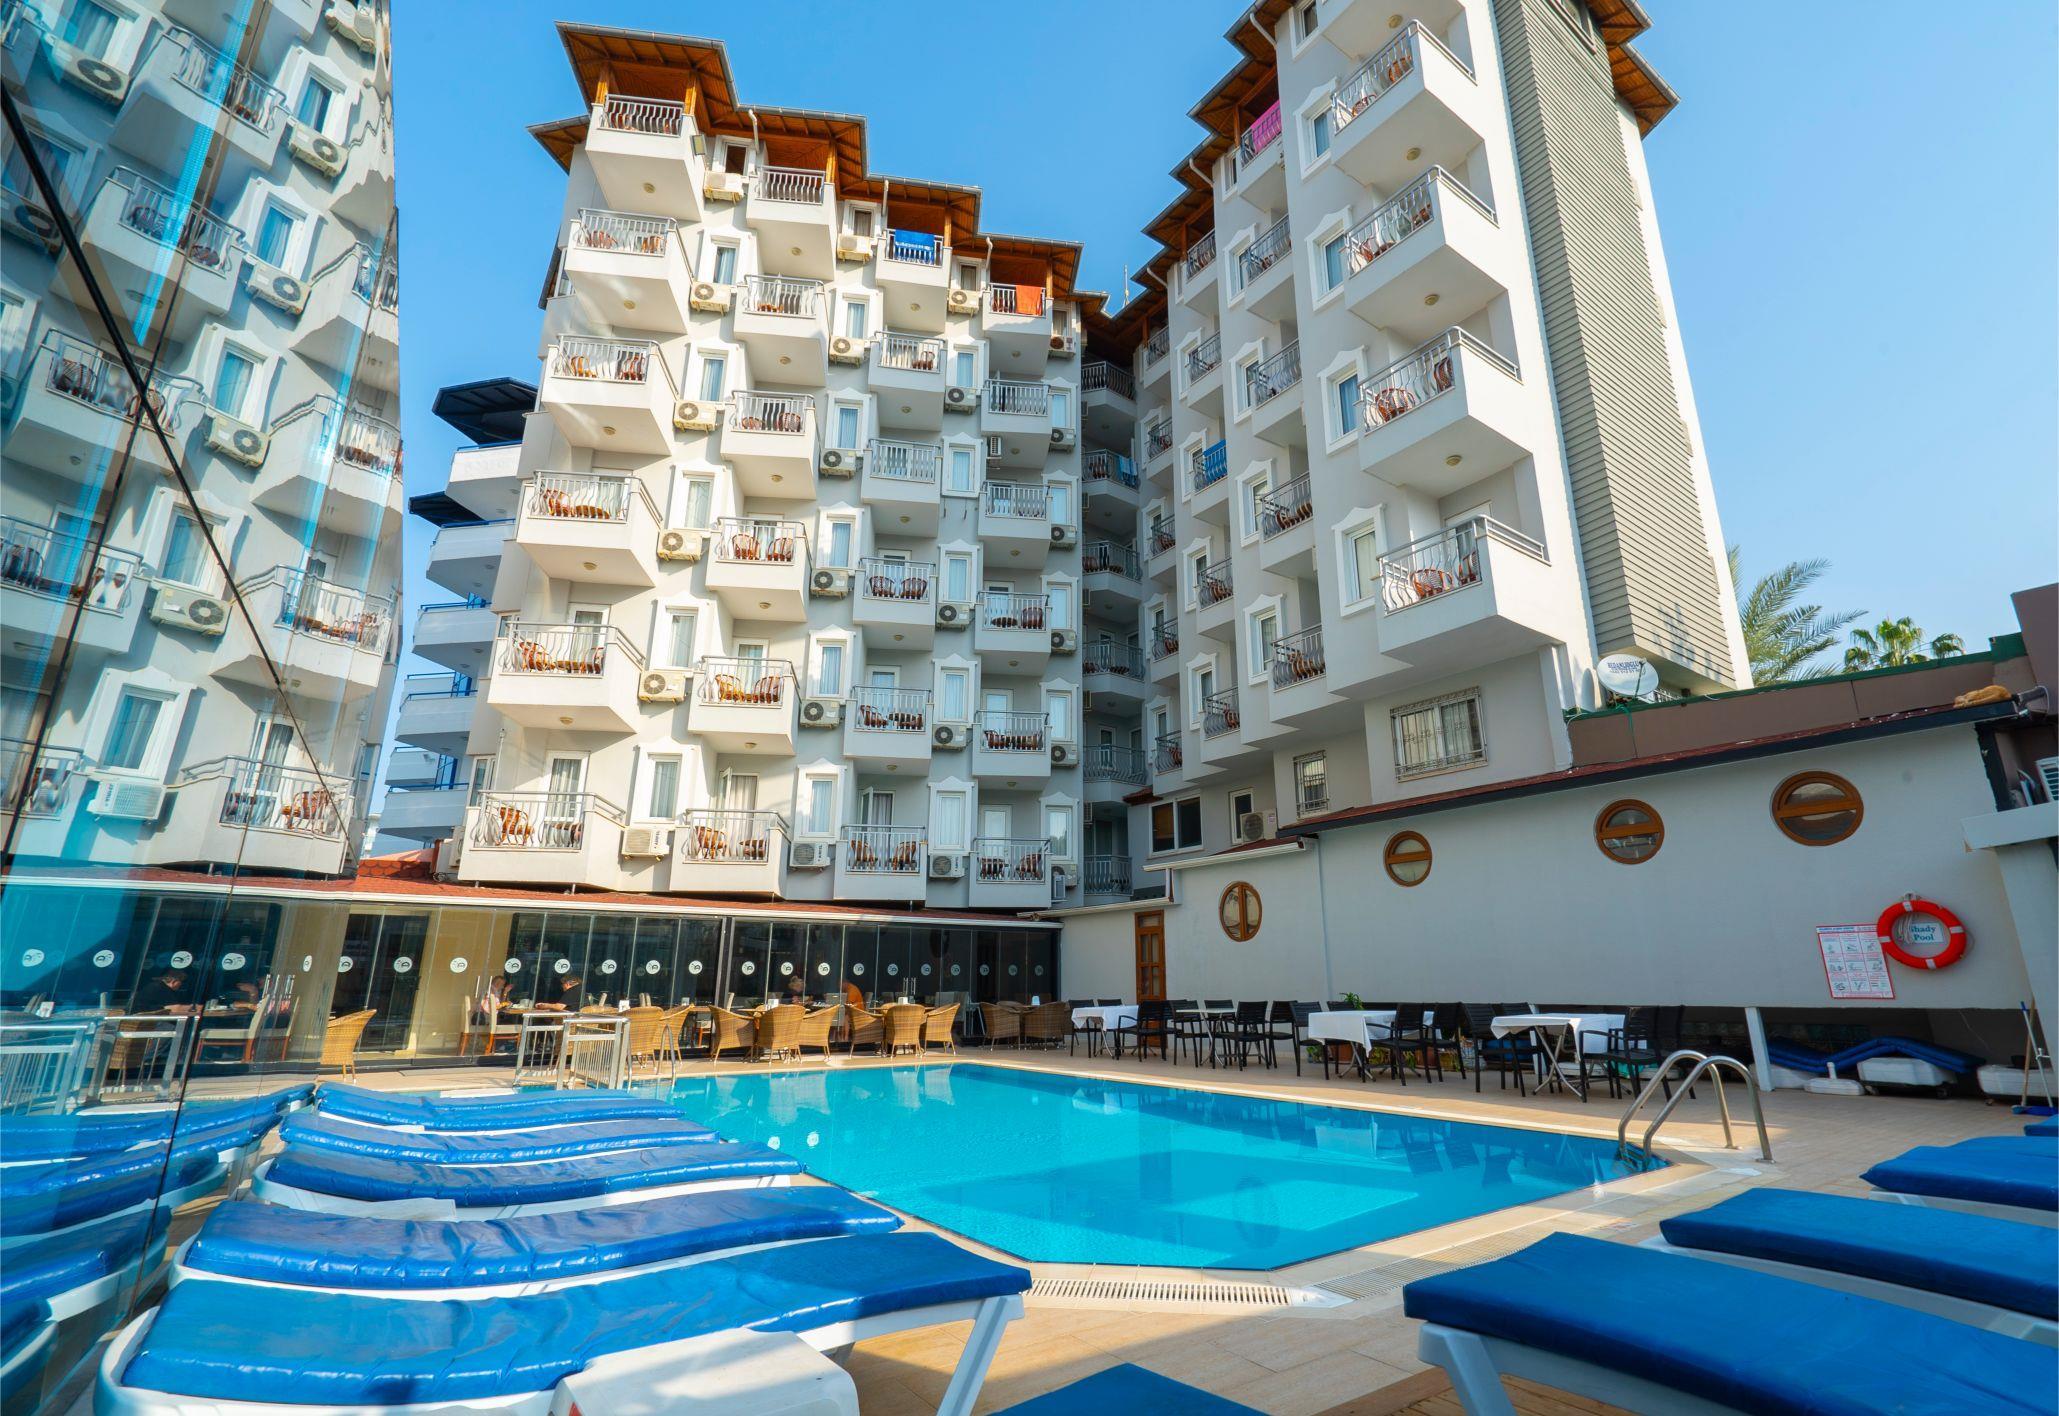 http://www.orextravel.sk/OREX/hotelphotos/azak-beach-general-0024.jpg